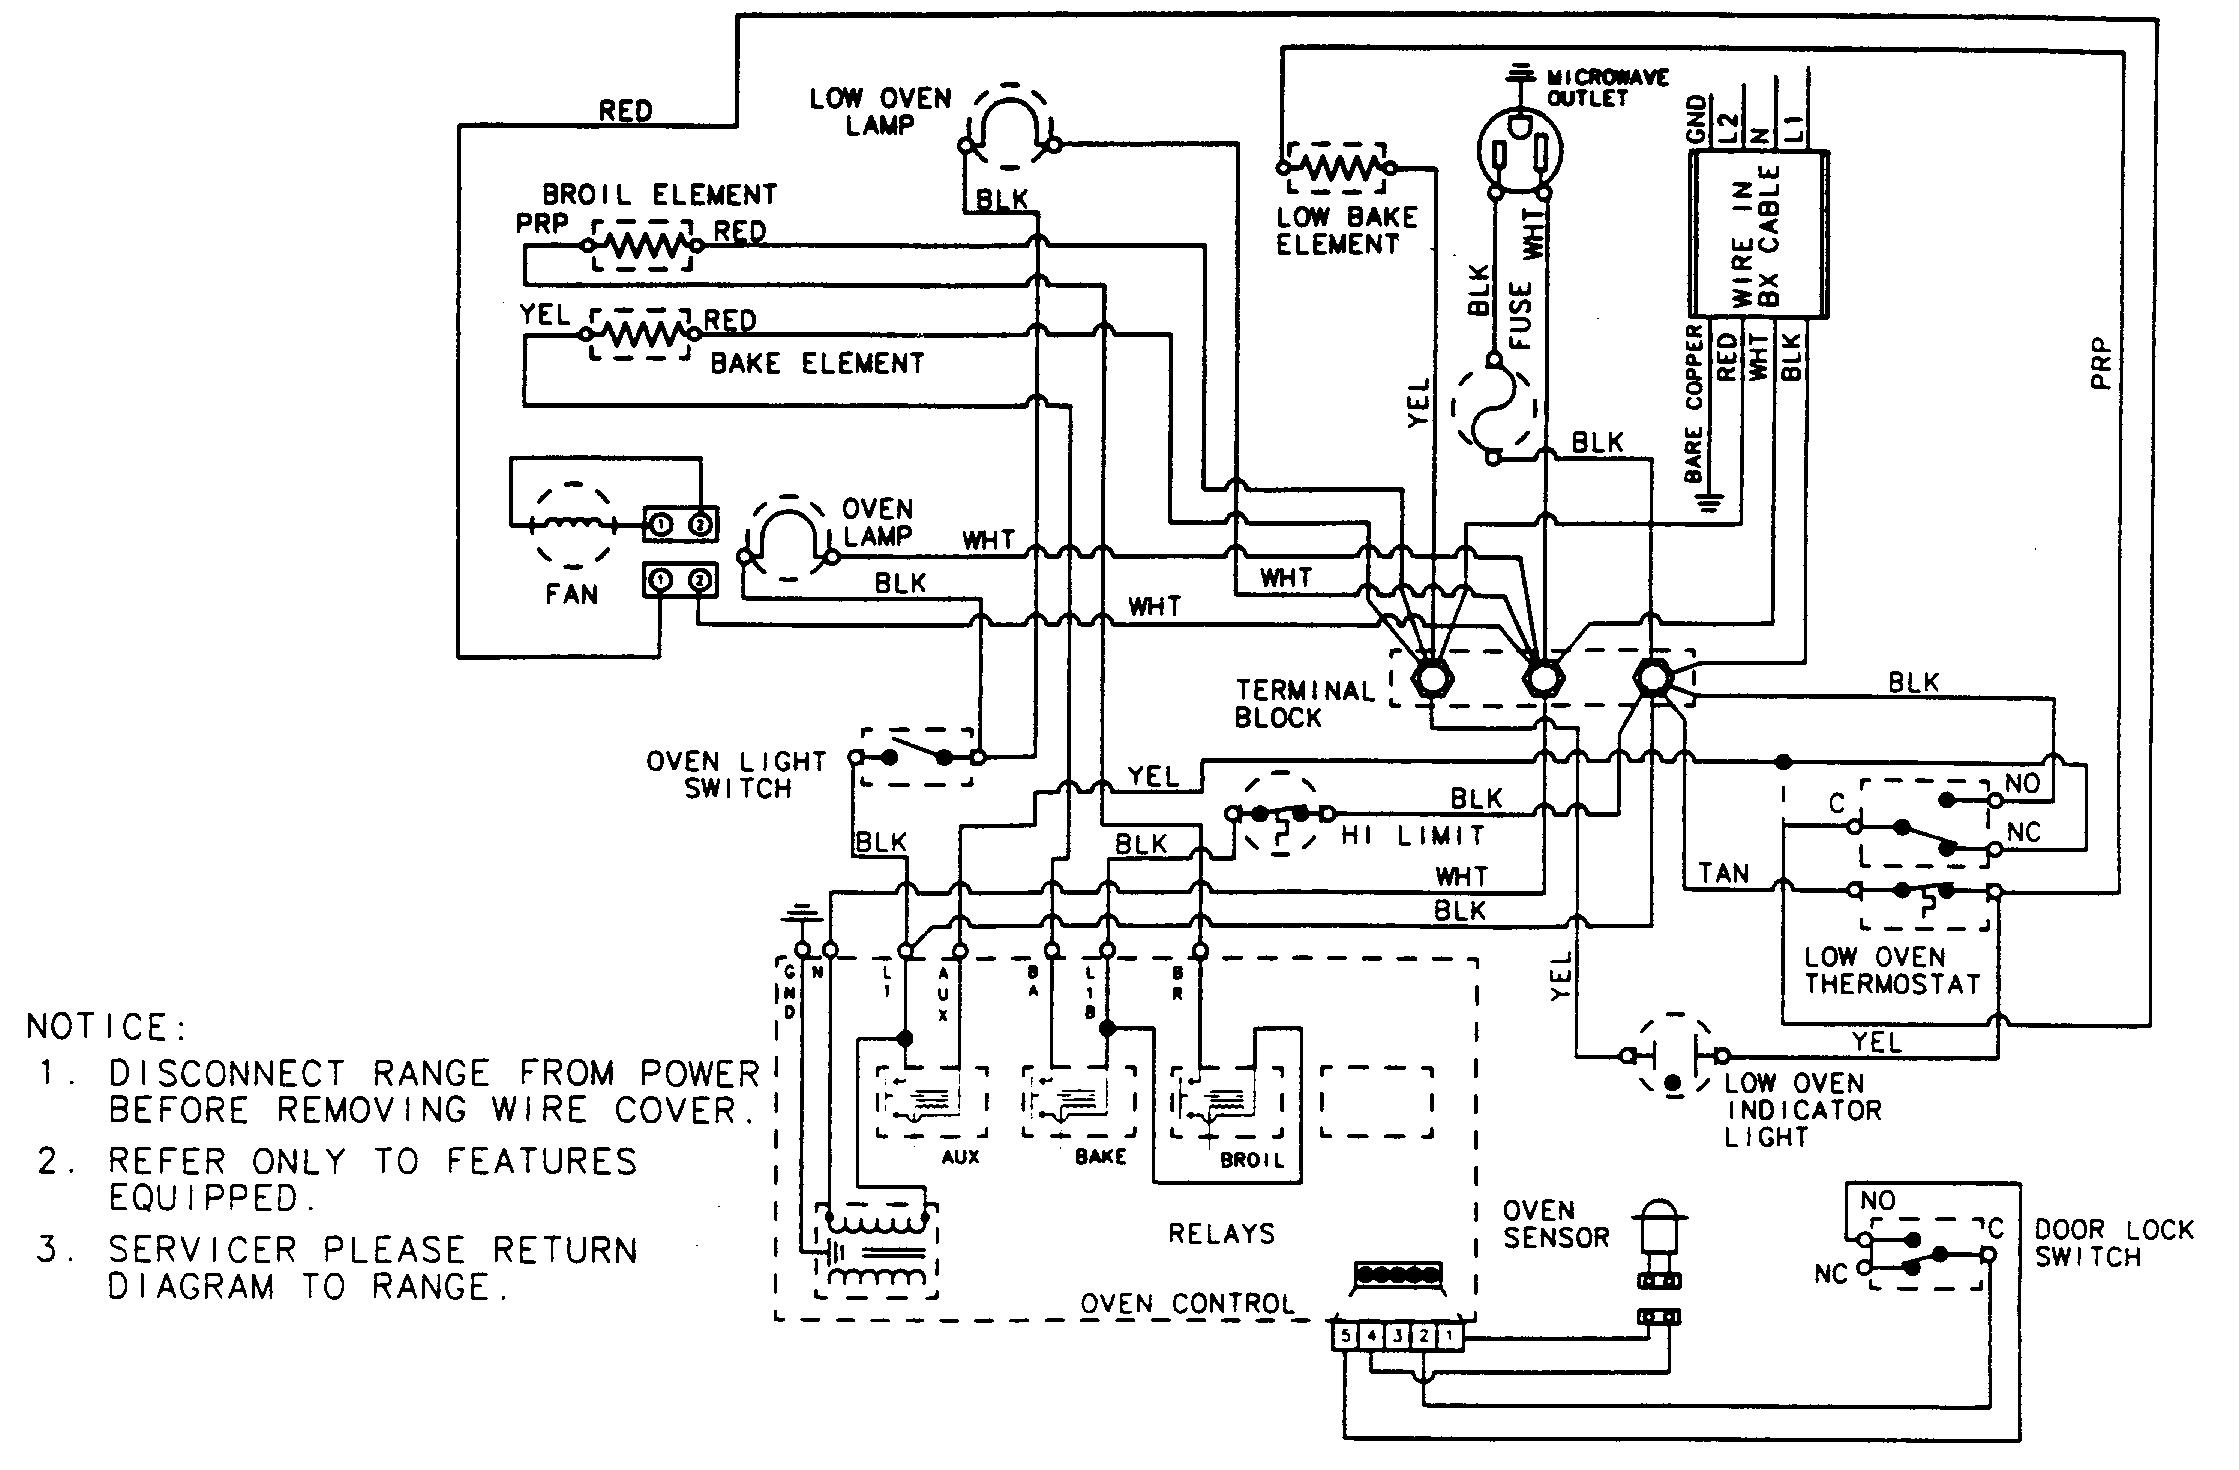 maytag stove element wiring diagram [ 2239 x 1470 Pixel ]